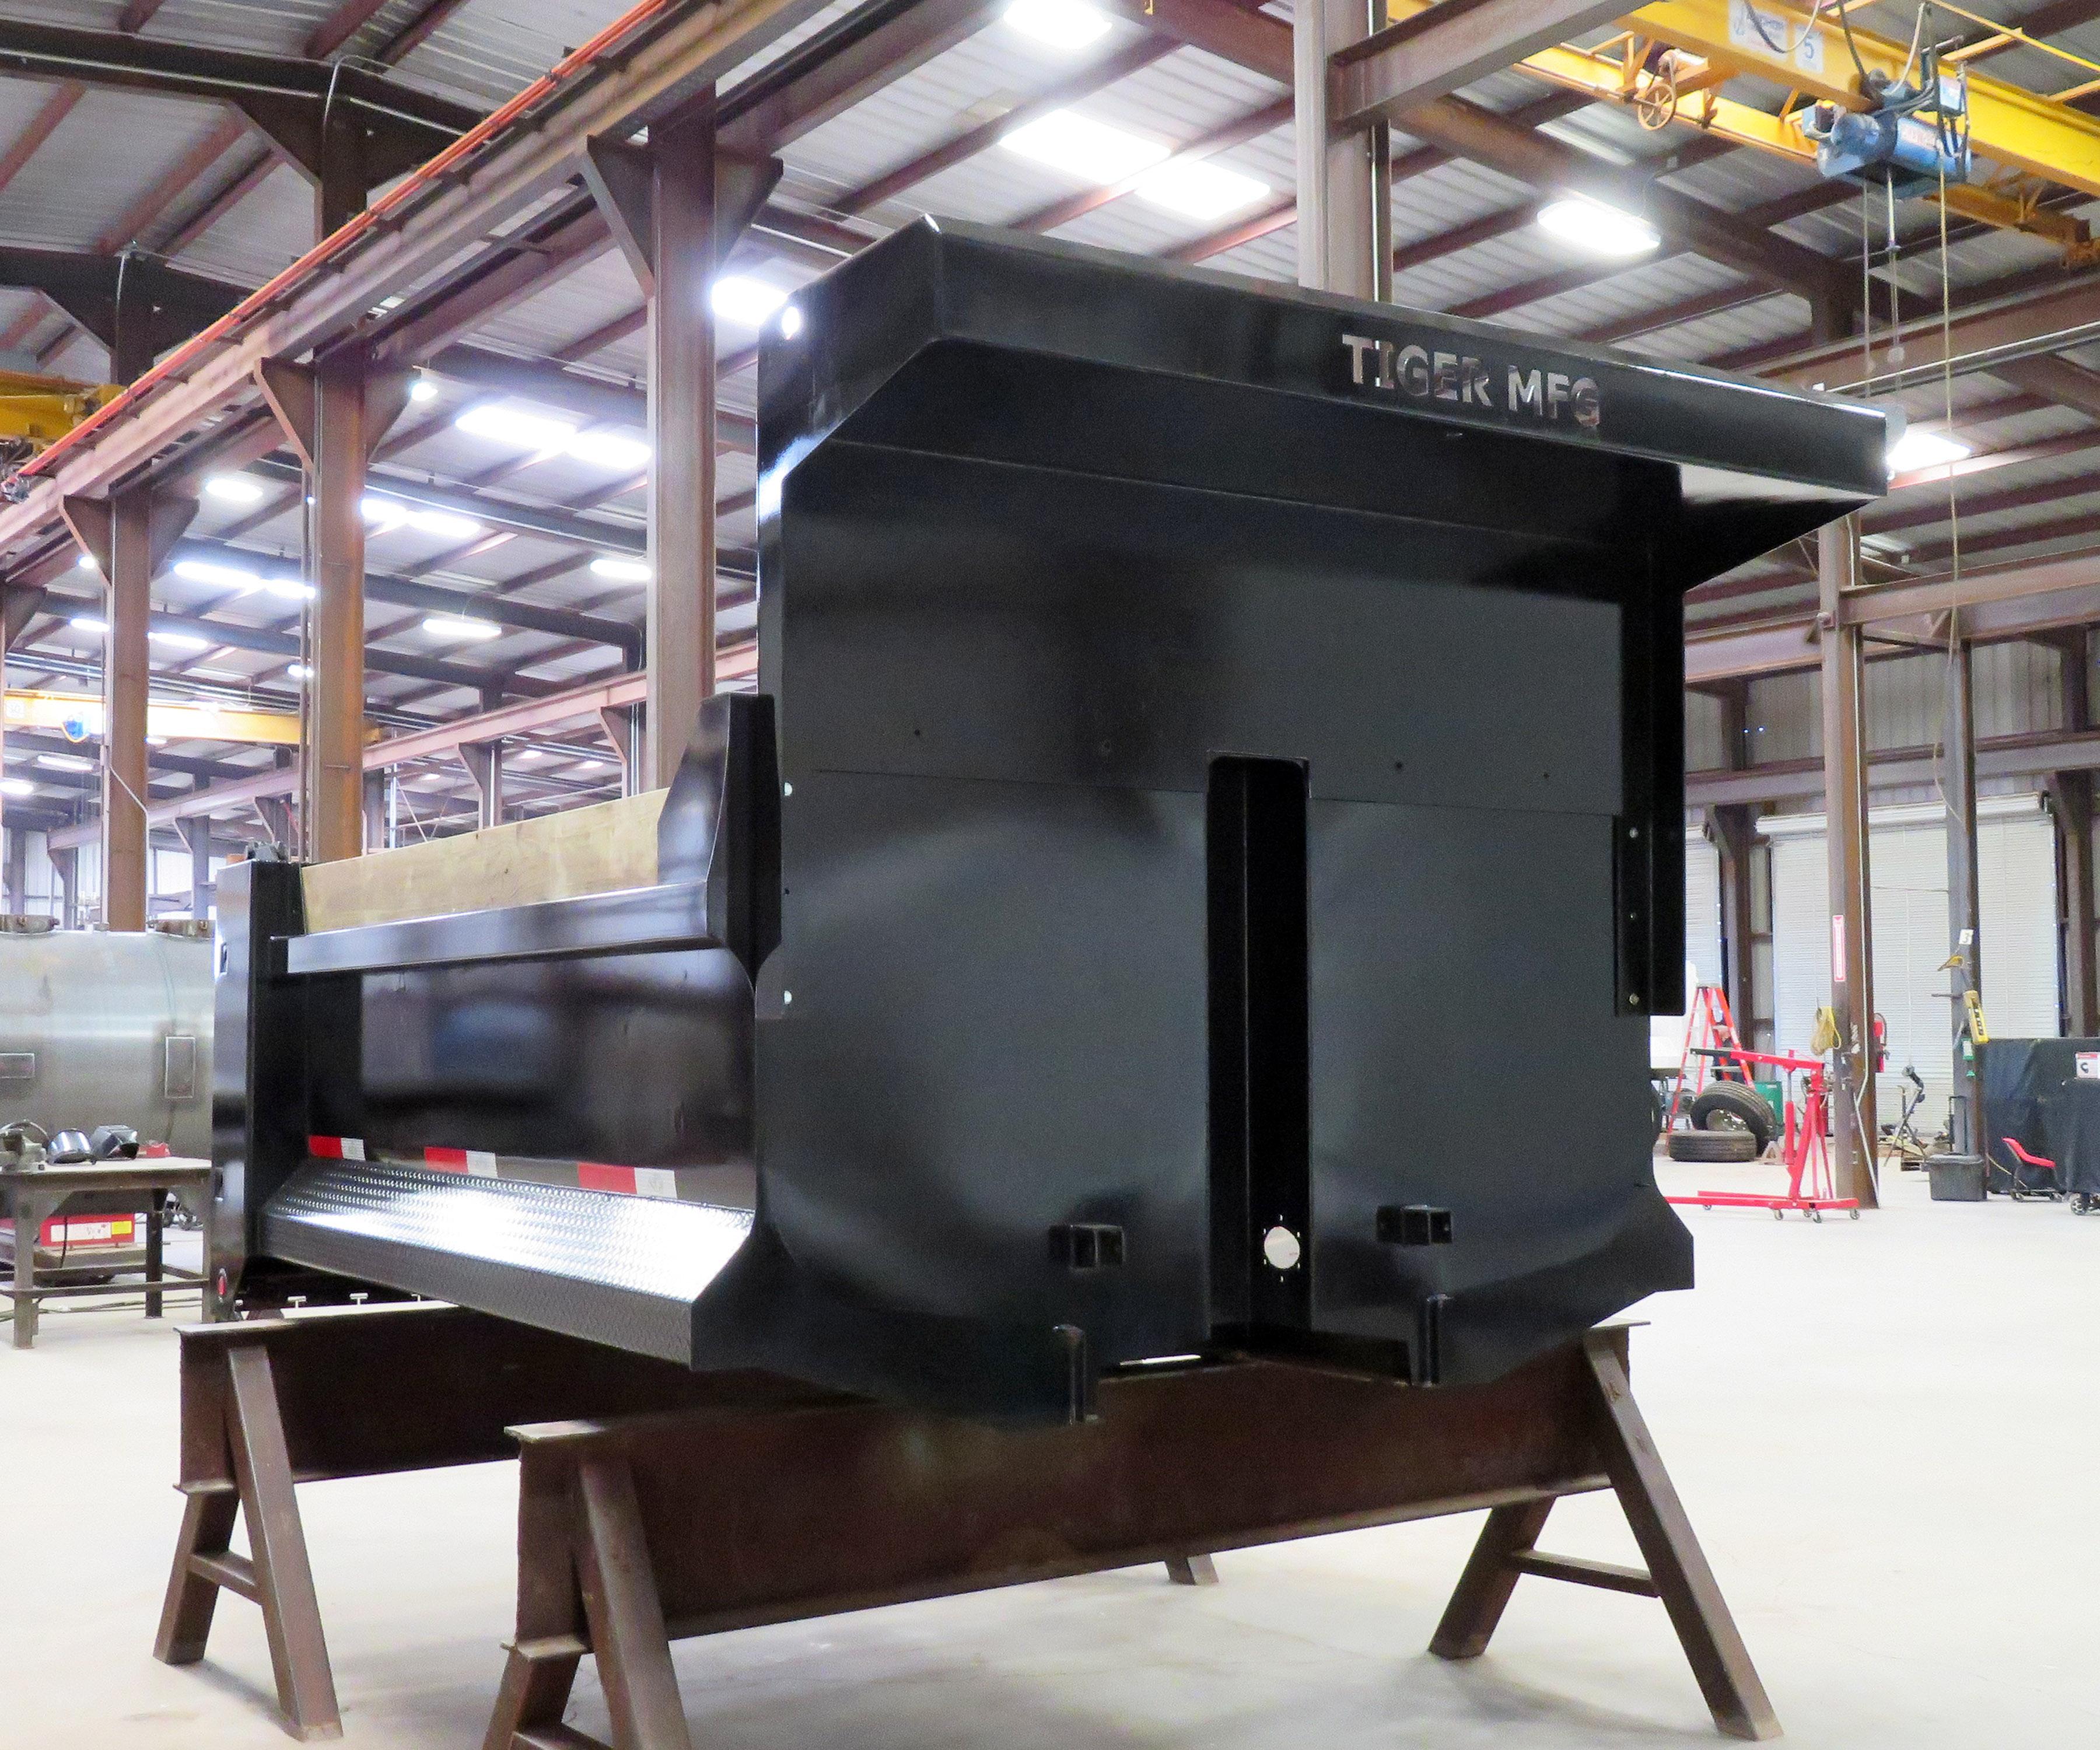 Tiger Manufacturing 10' Dump Bed